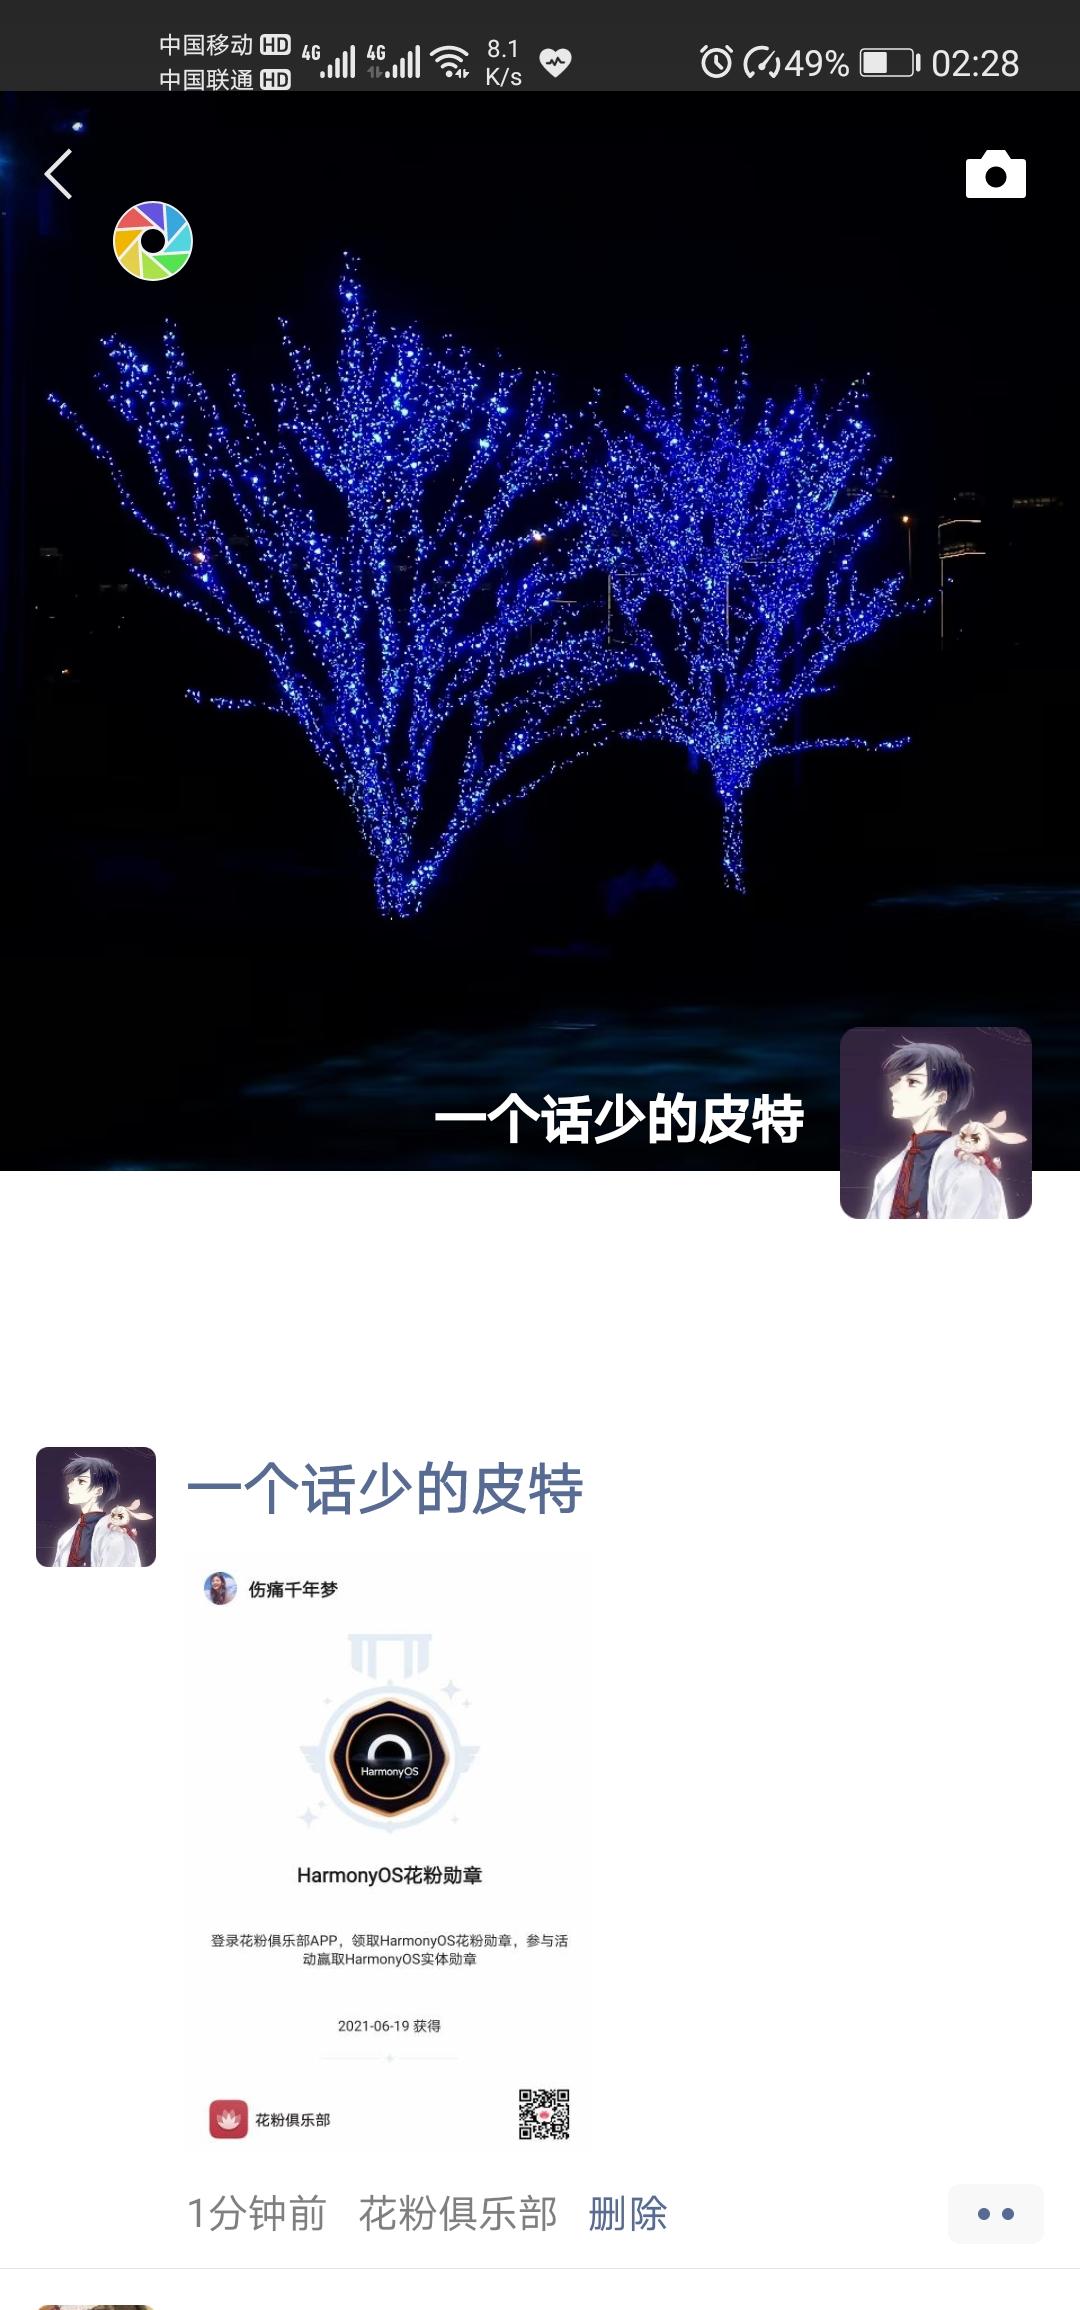 Screenshot_20210619_022804_com.tencent.mm.jpg